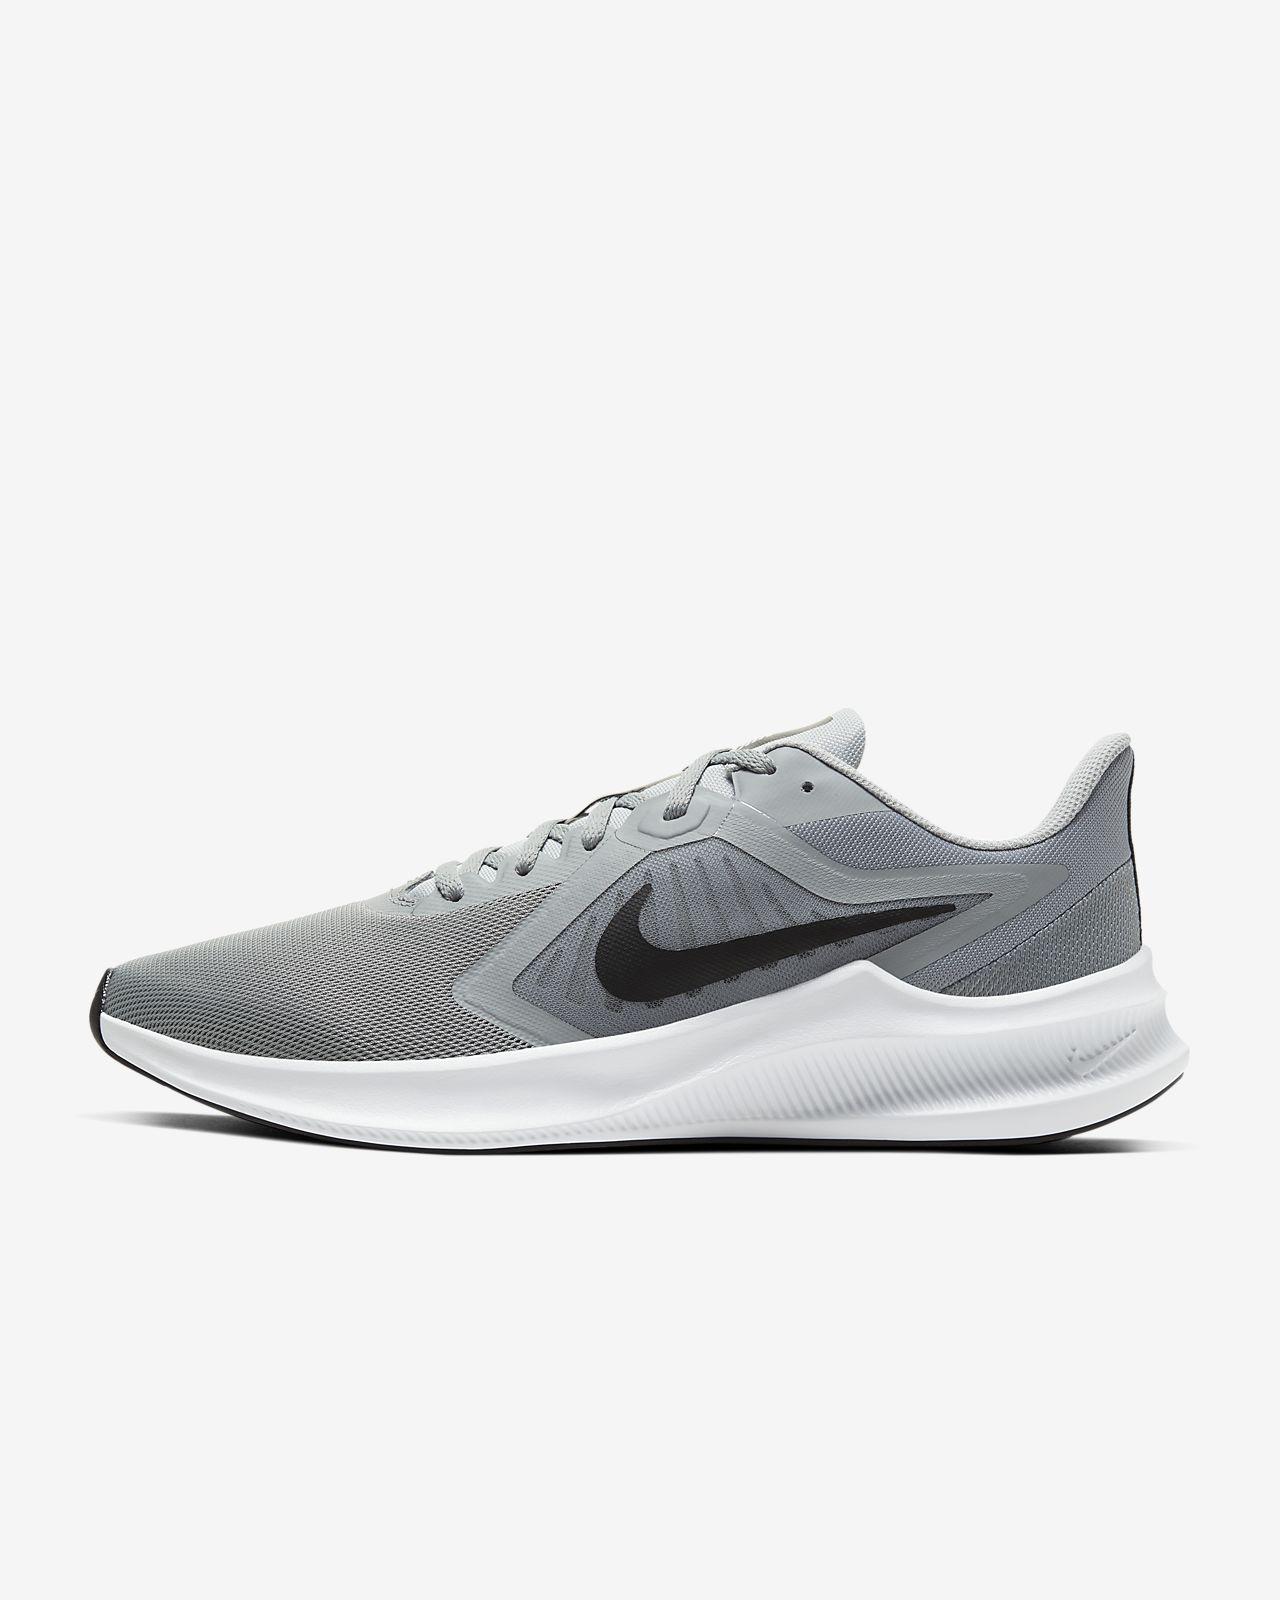 Nike Downshifter 10 男子跑步鞋